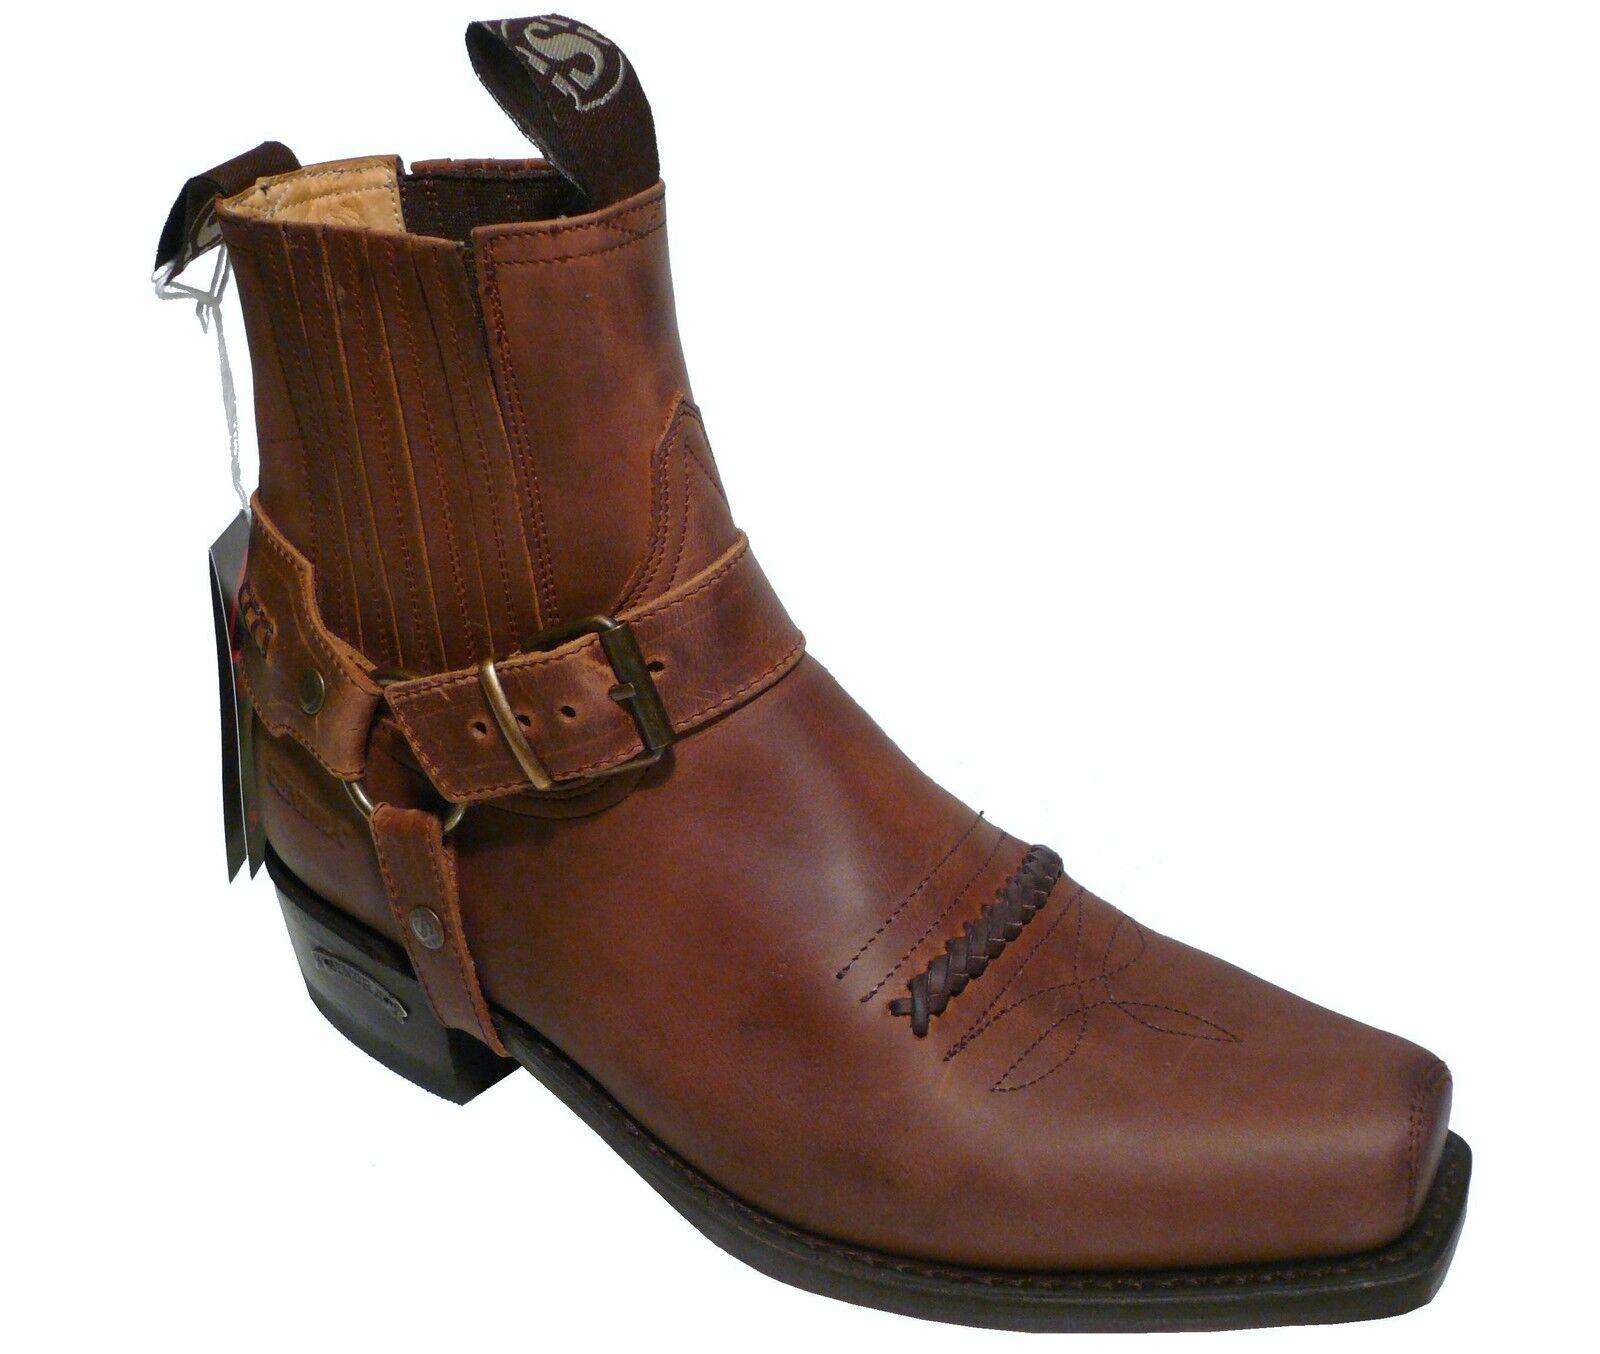 Sendra Boots Cowboyboots Style No. 6445 brown